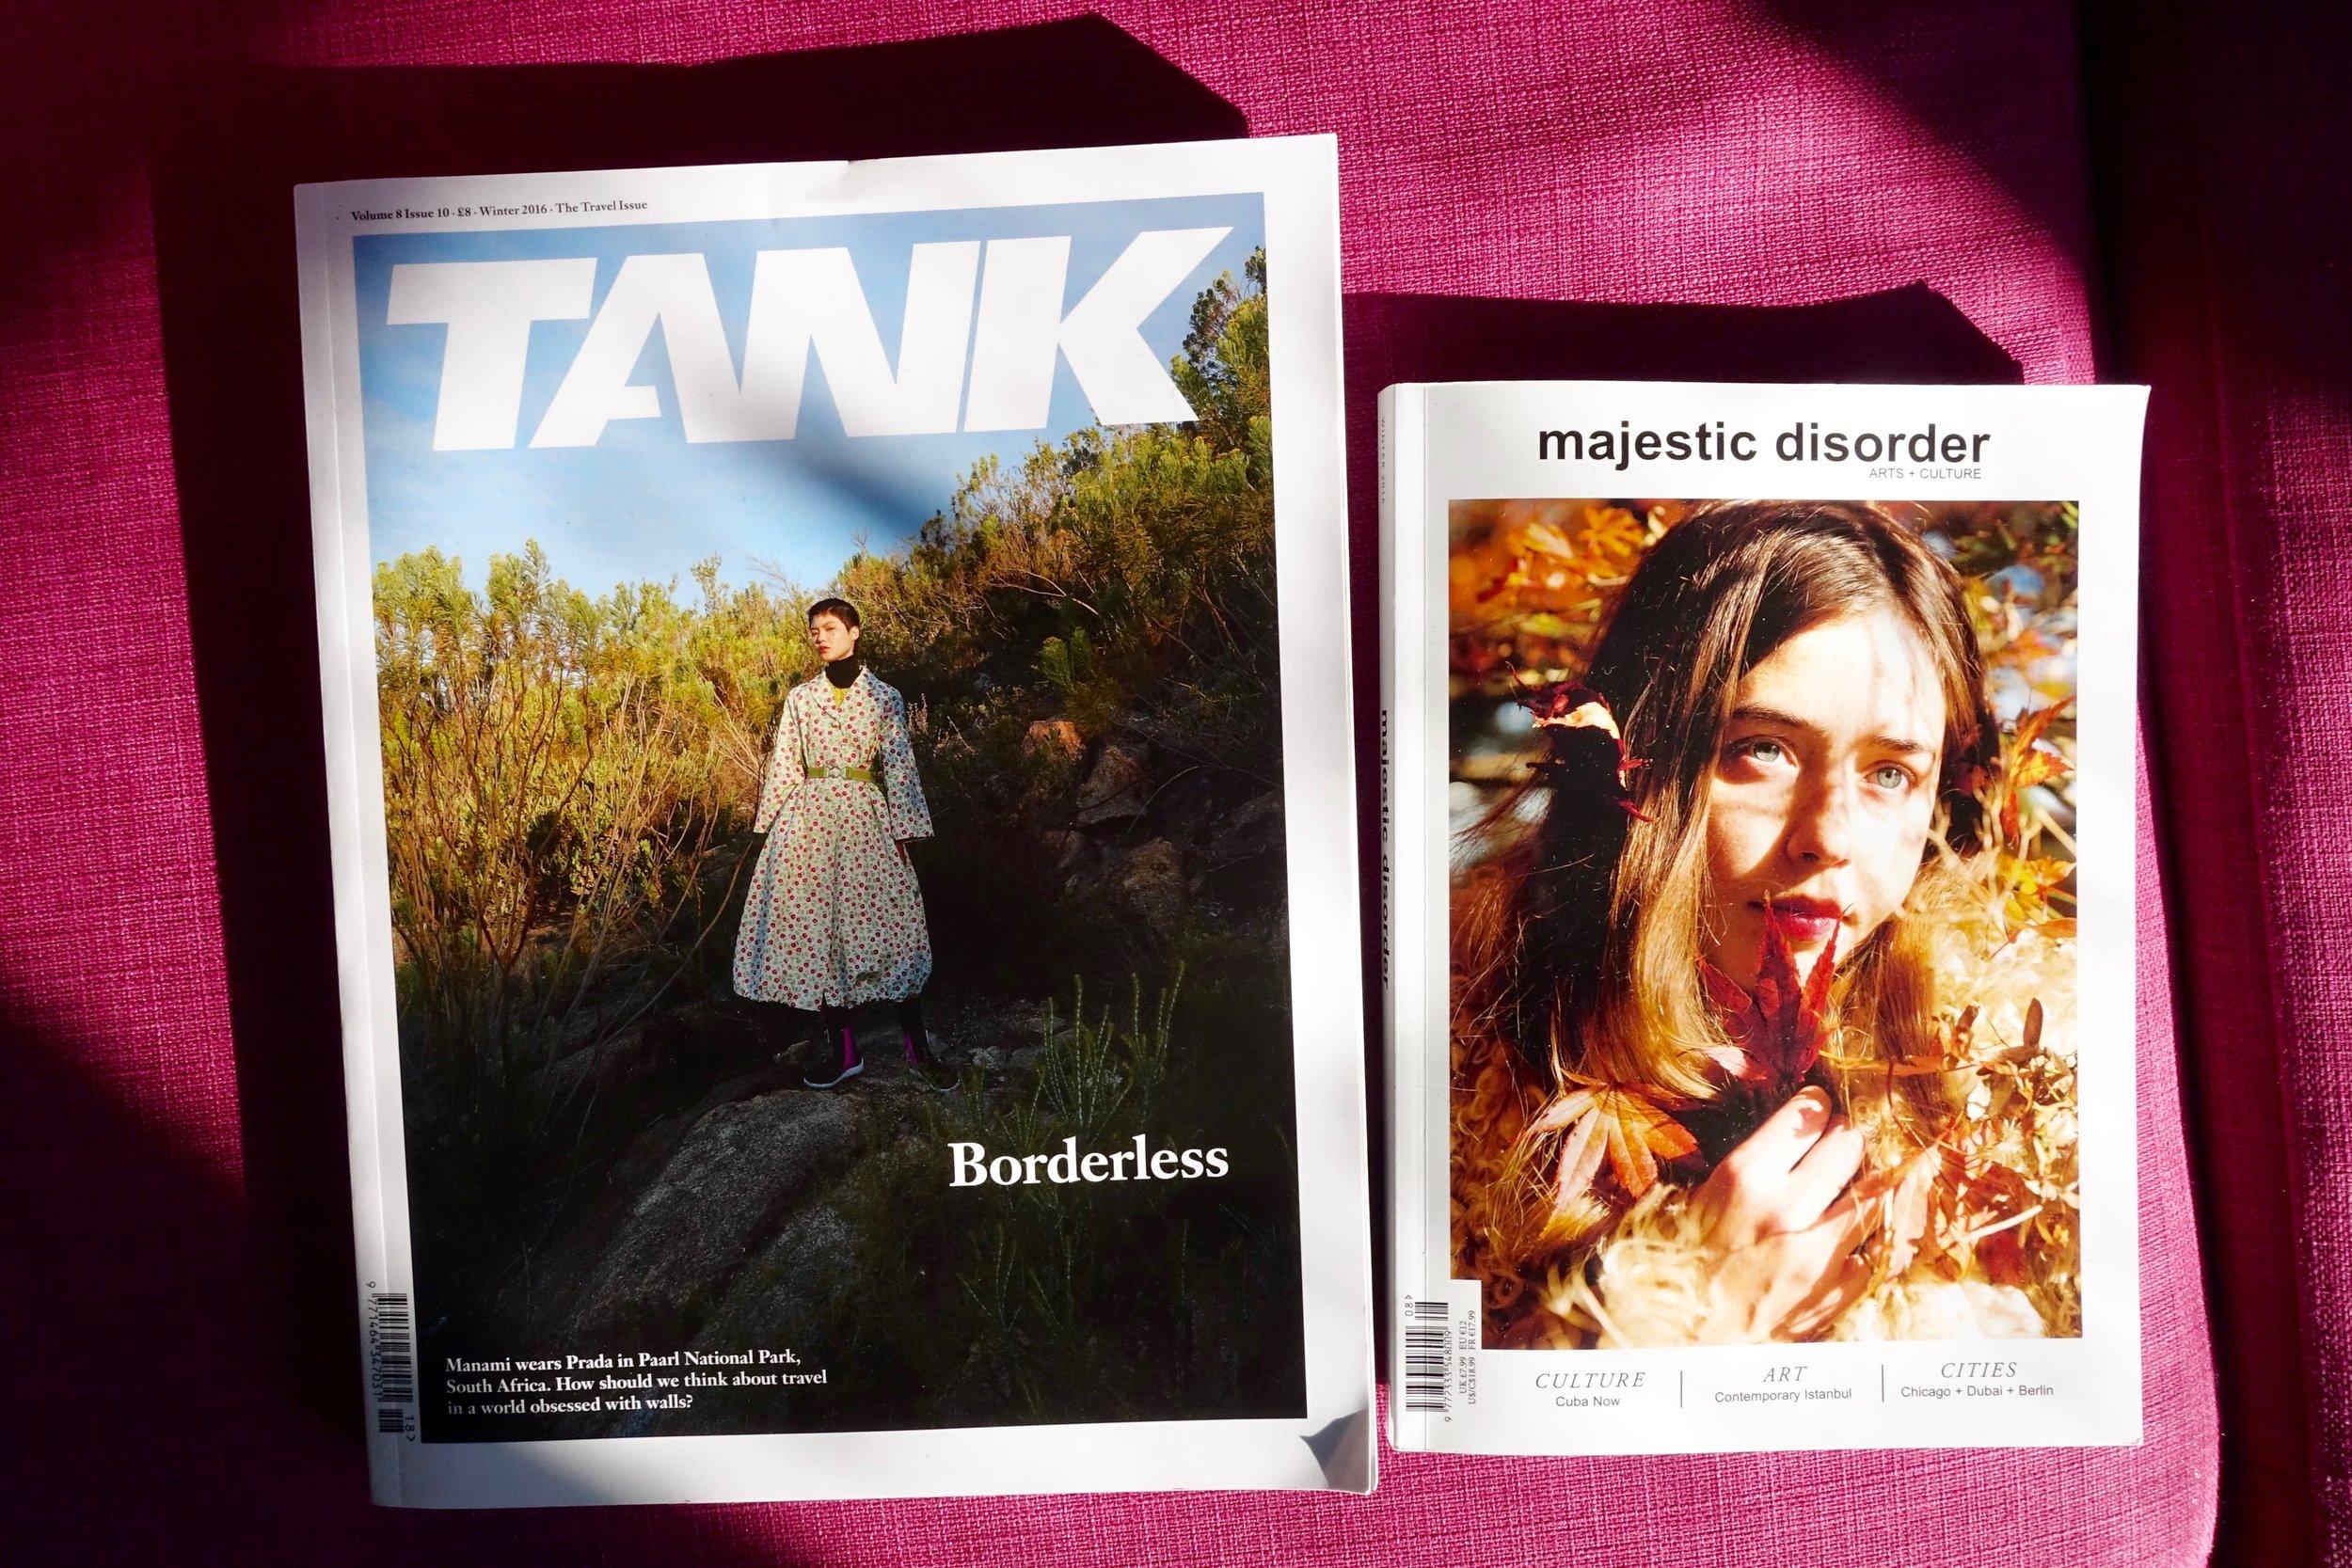 tank+magazine+majestic+disorder+magazine.jpg